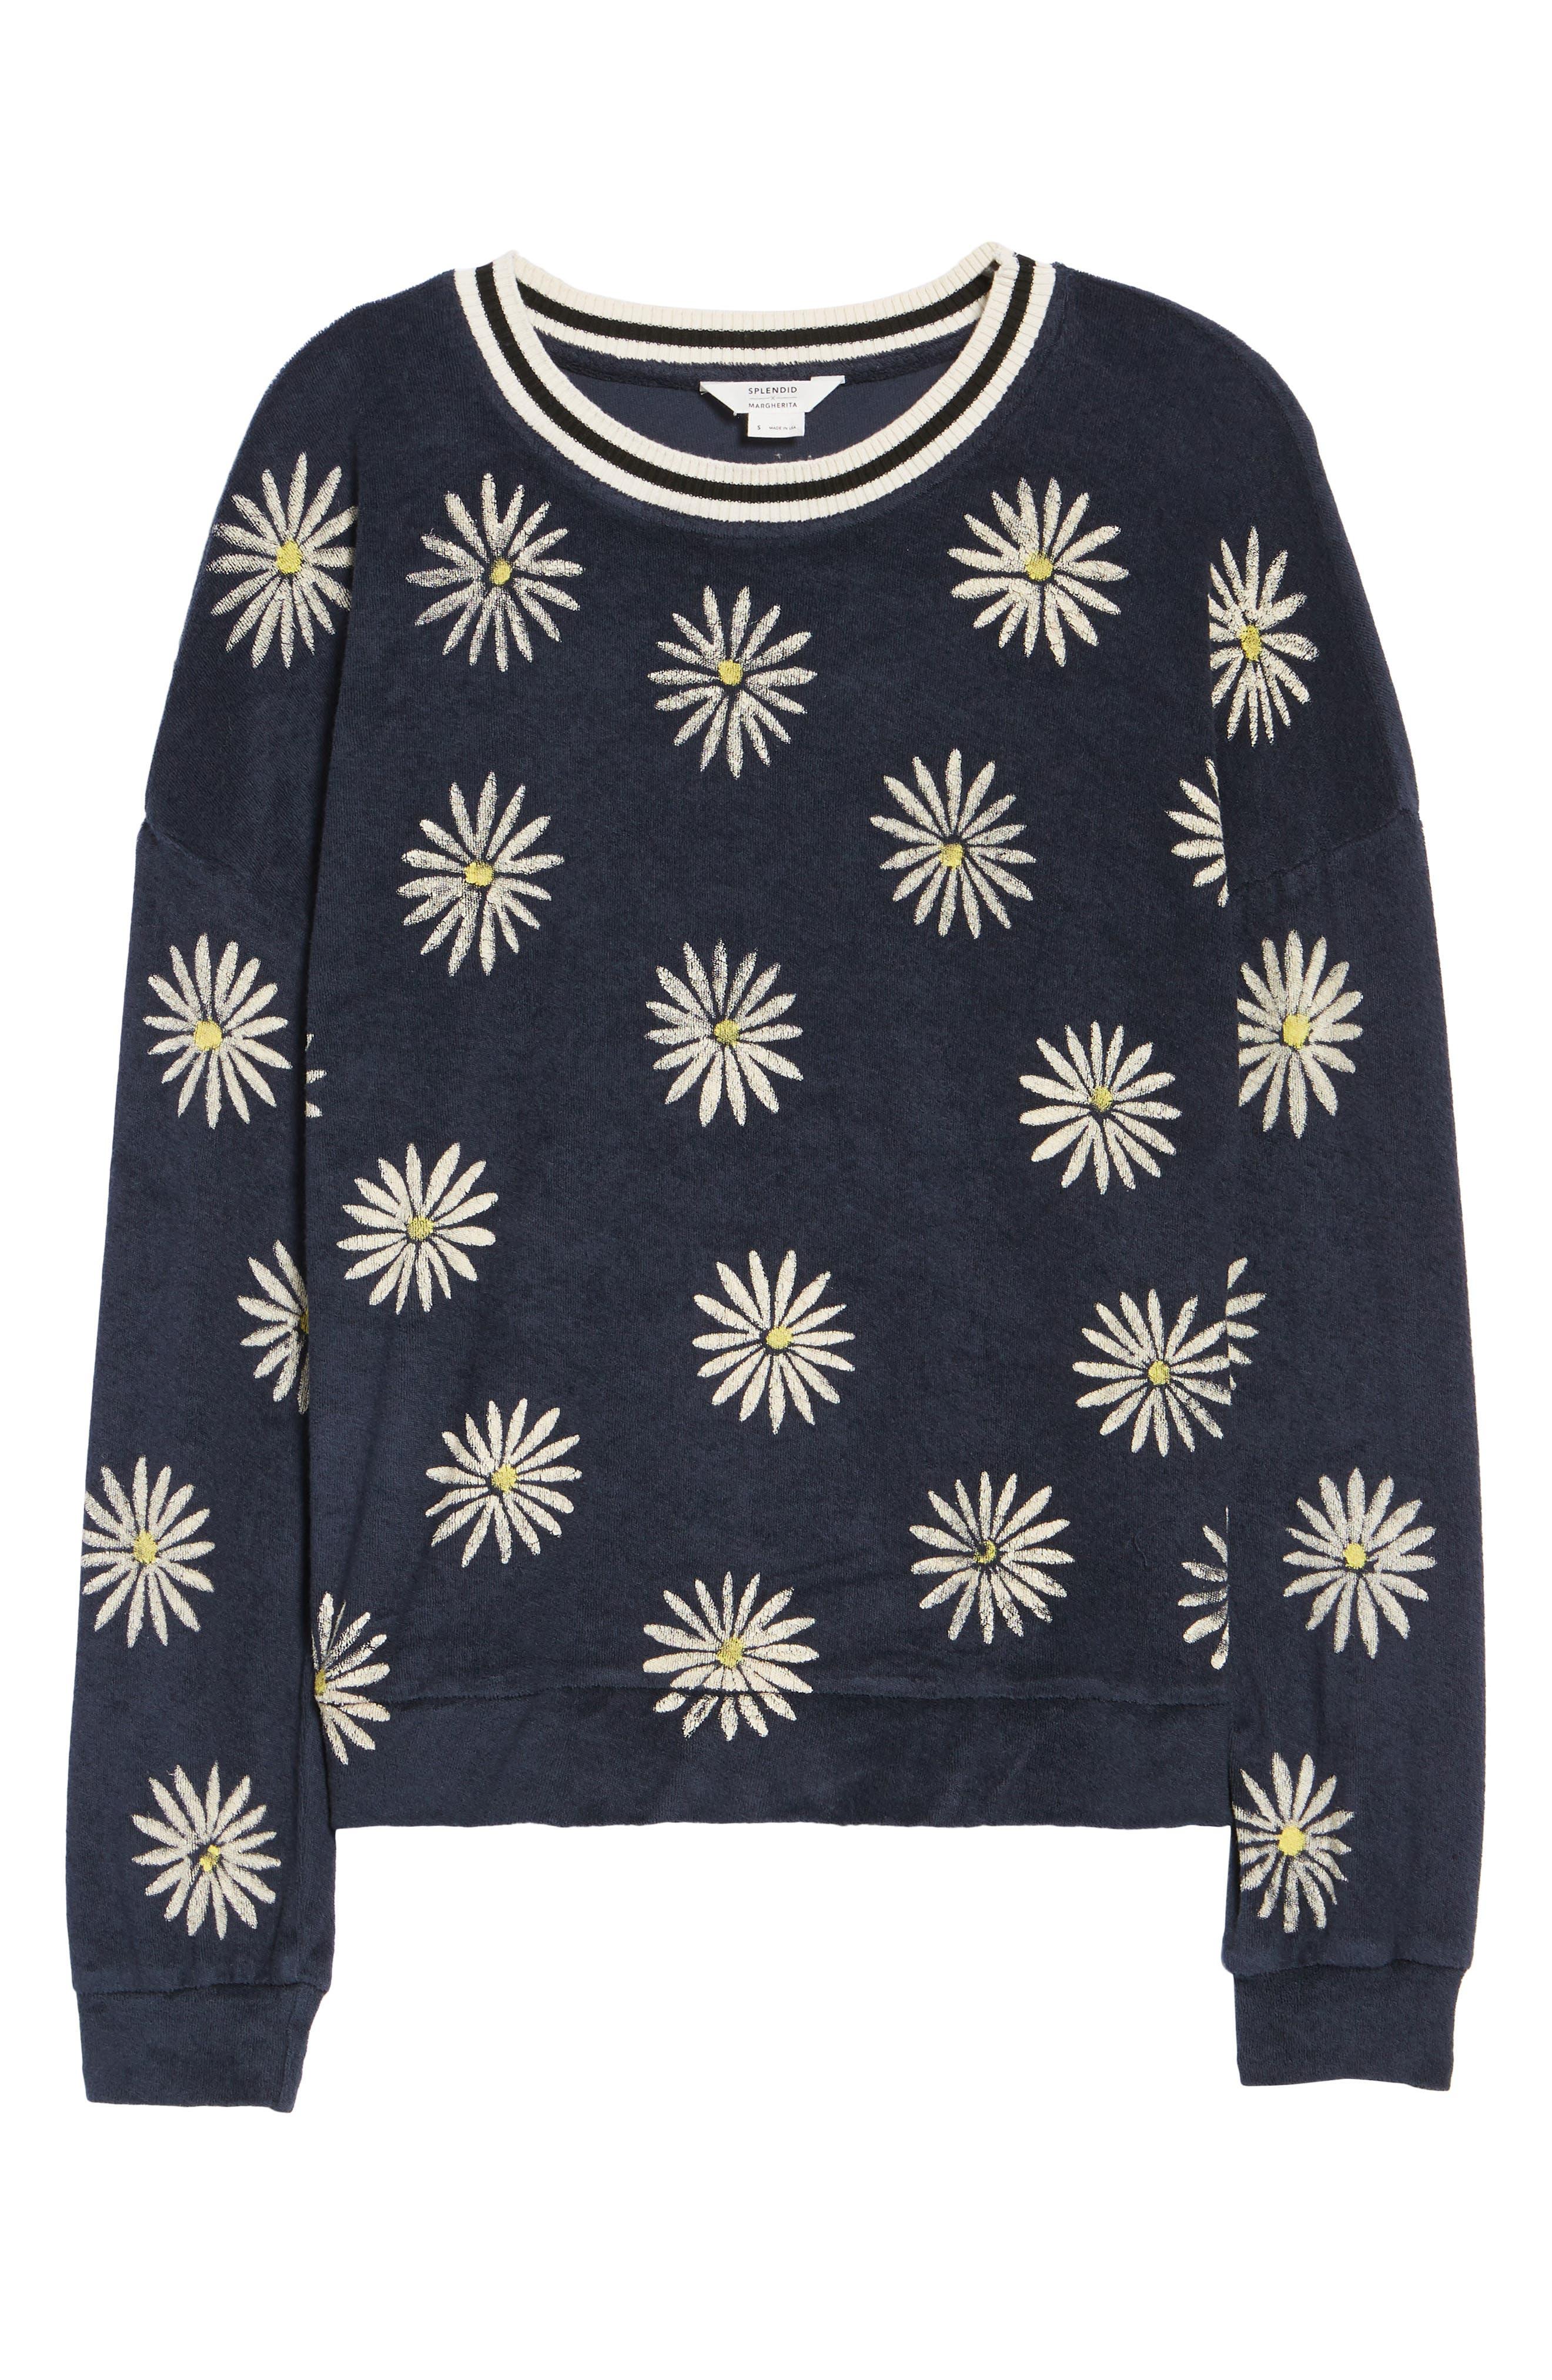 x Margherita Fiore Daisy Sweatshirt,                             Alternate thumbnail 8, color,                             Navy